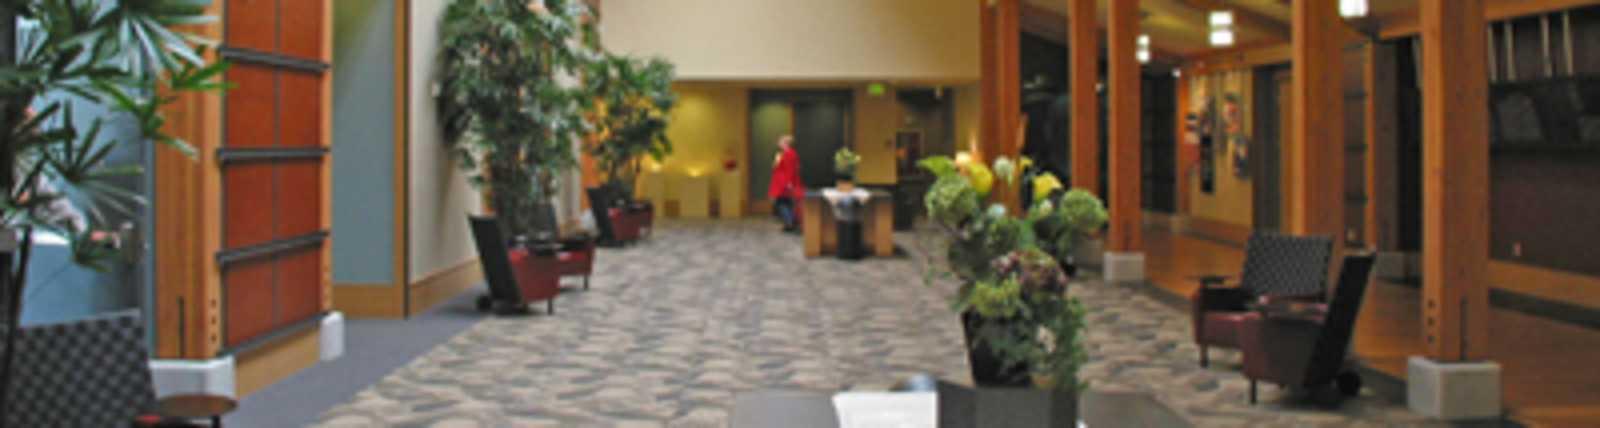 meeting-facility-Cedarbrook_Lodge_Meeting_Facility-4.jpg